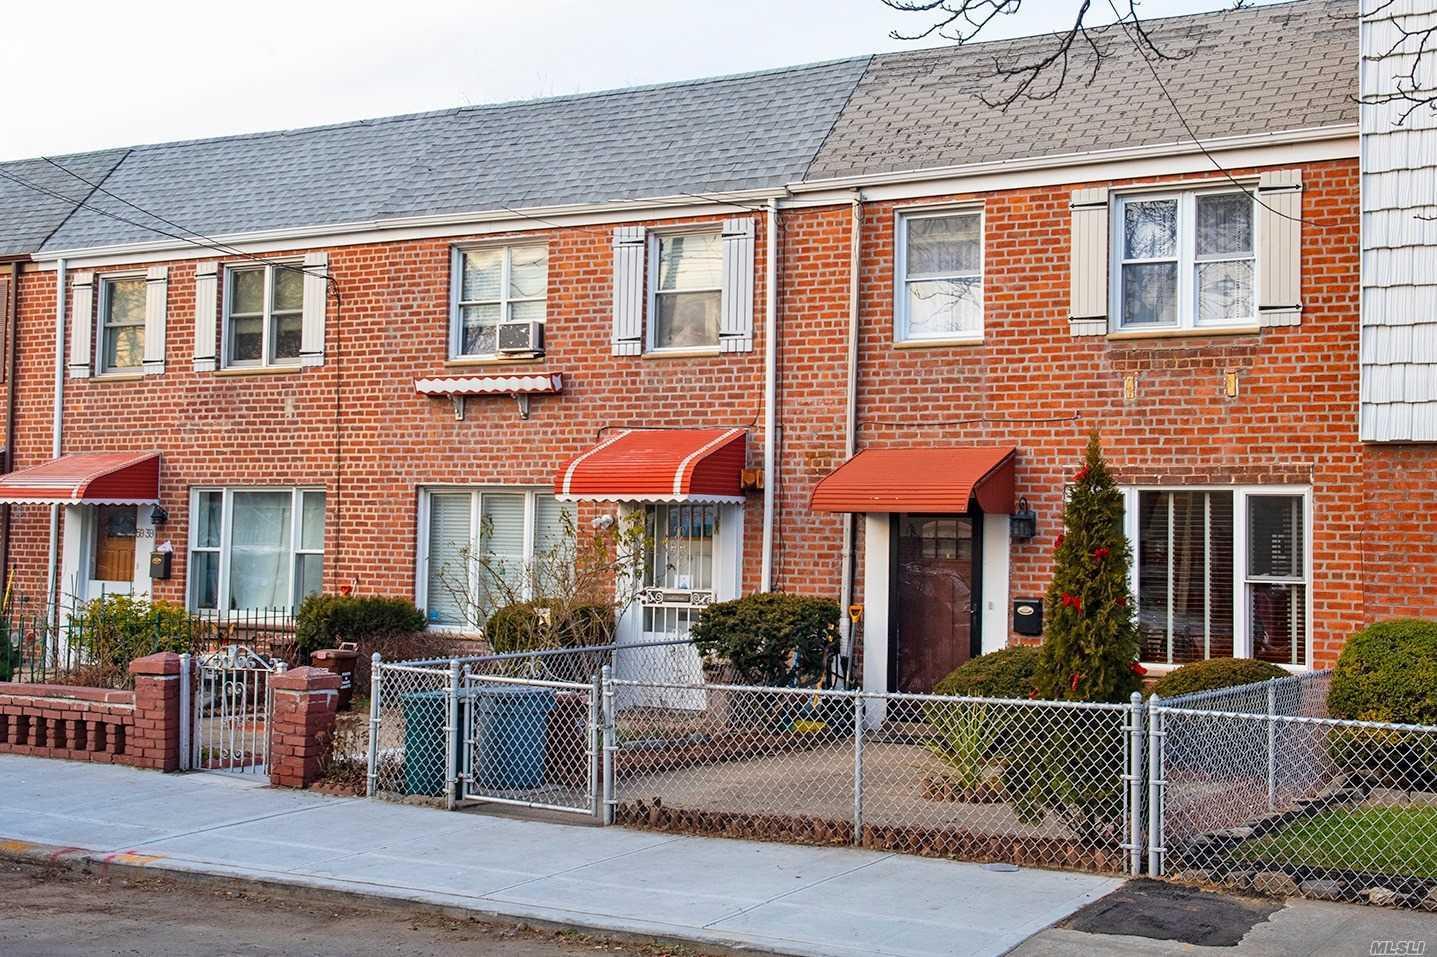 Property for sale at 59-43 58 Drive, Maspeth NY 11378, Maspeth,  New York 11378